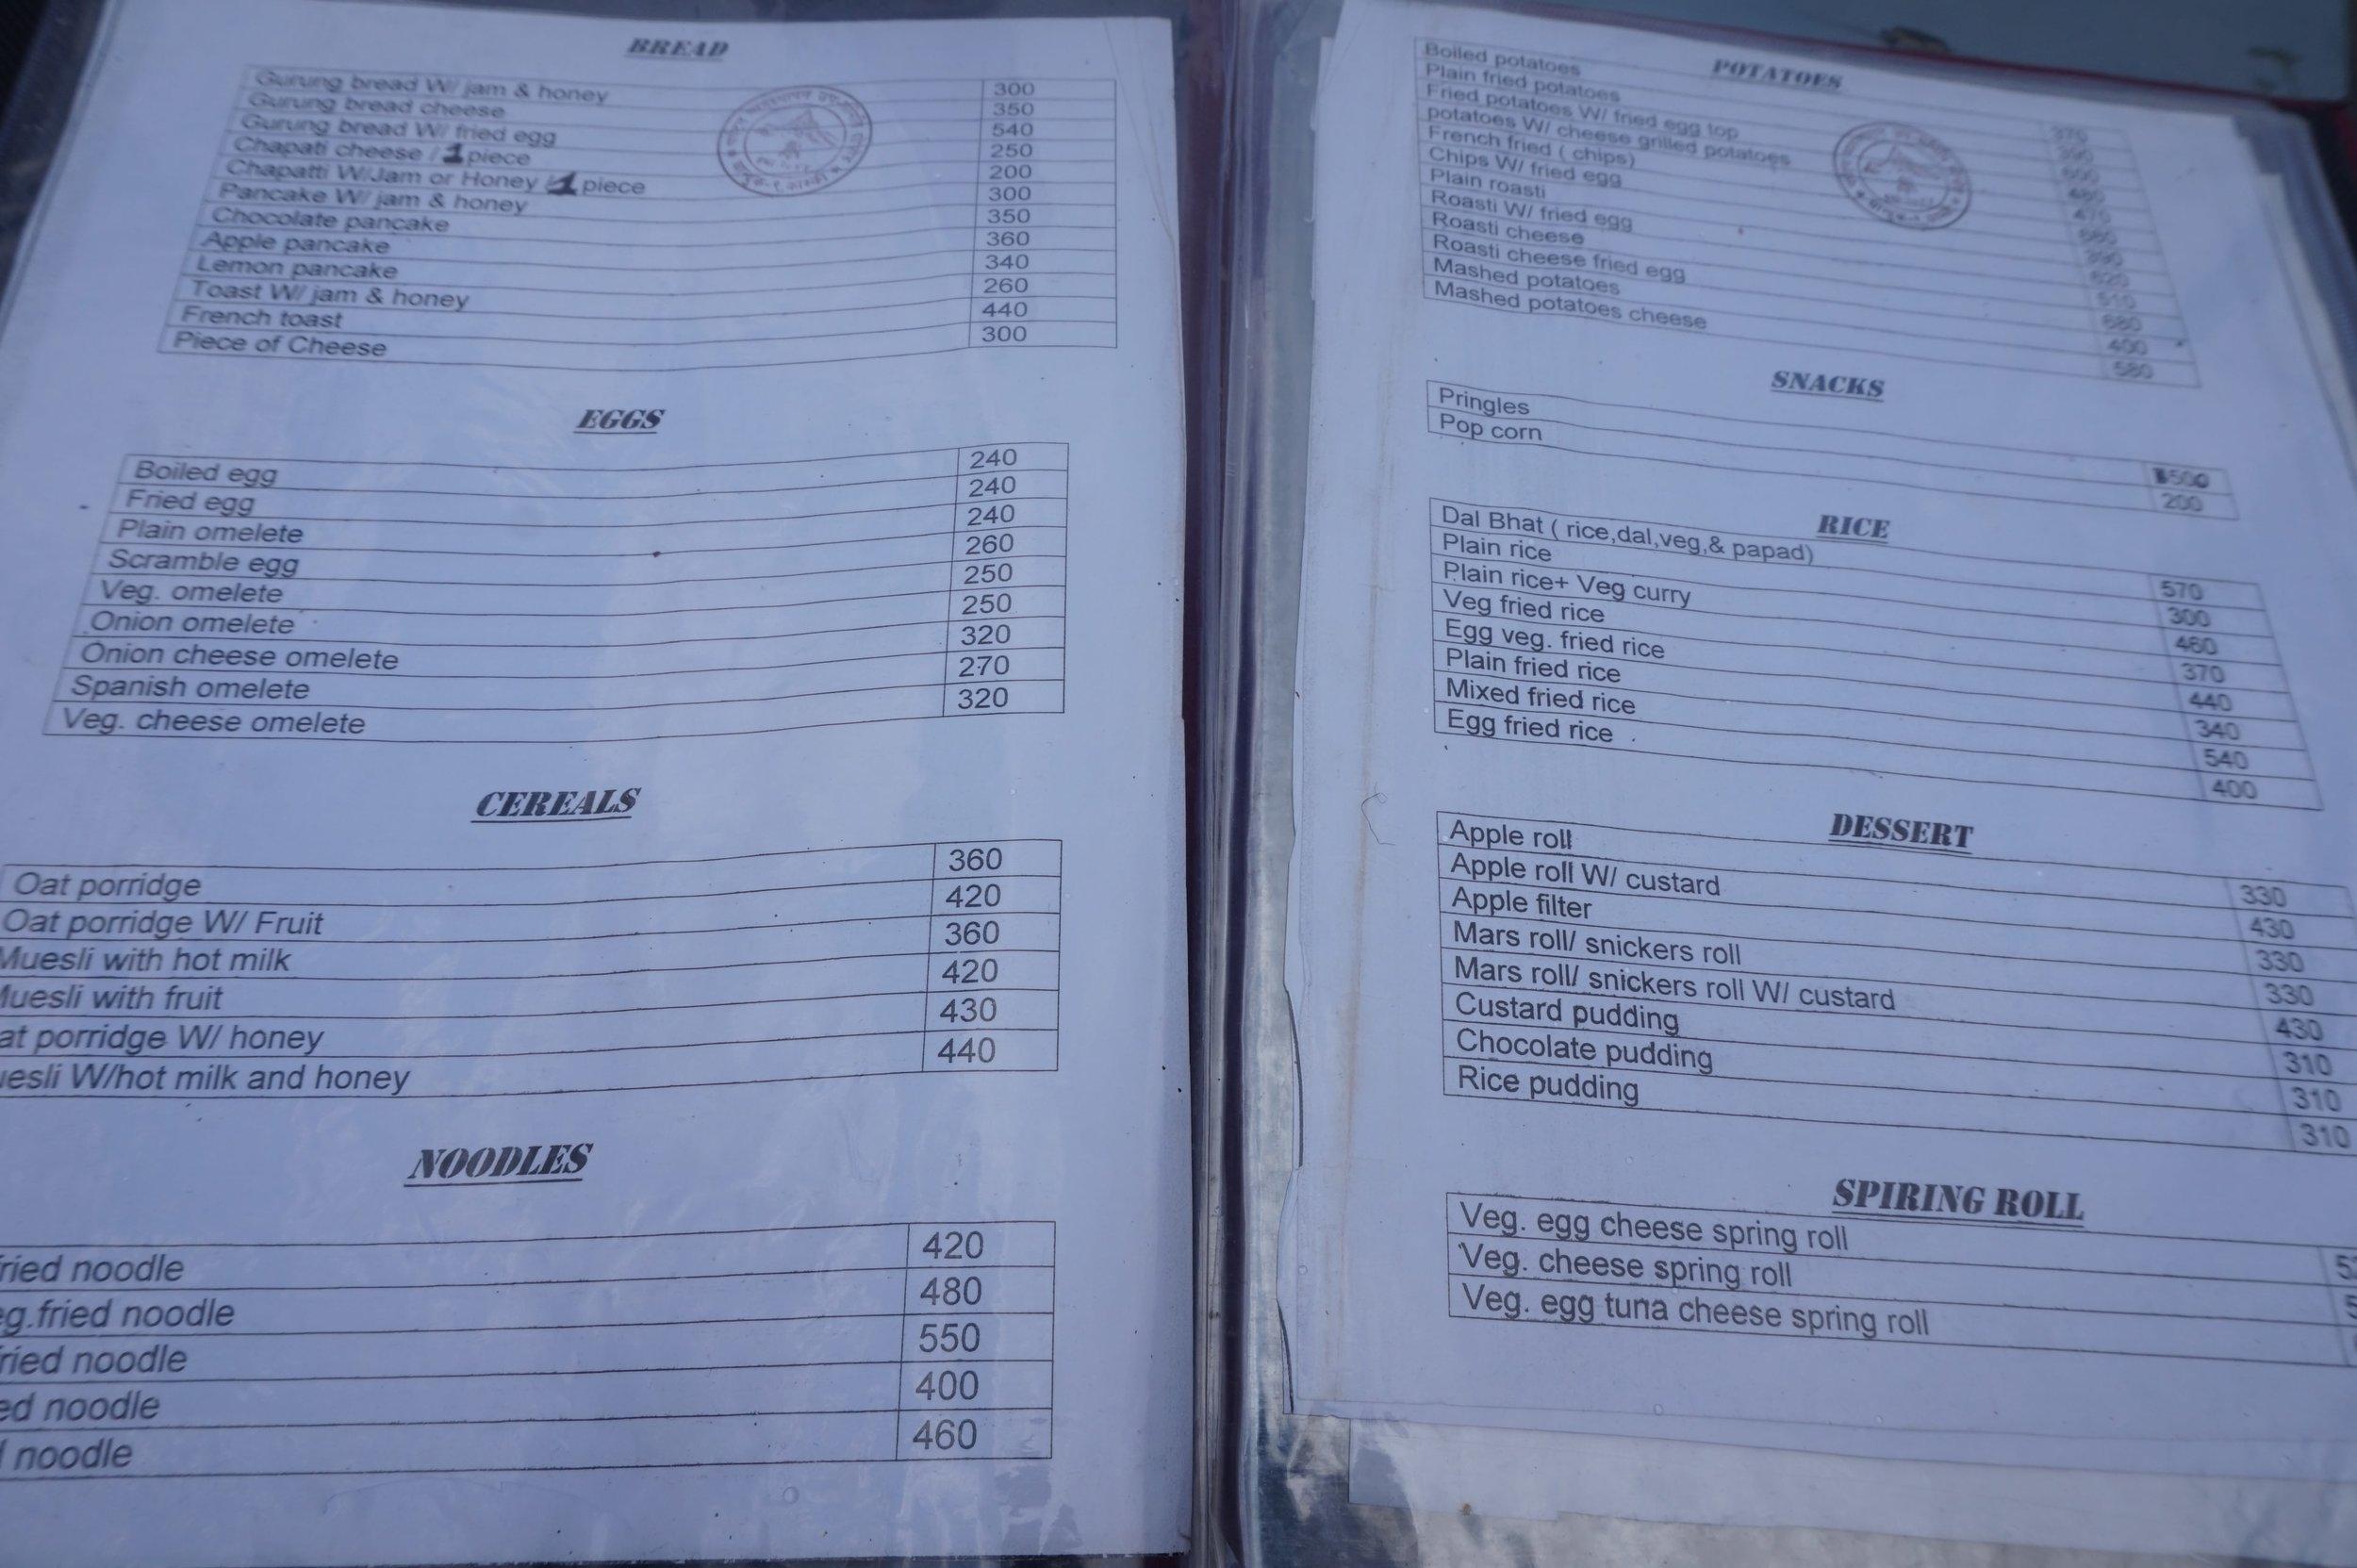 The menu is very similar at the tea houses along the trek.